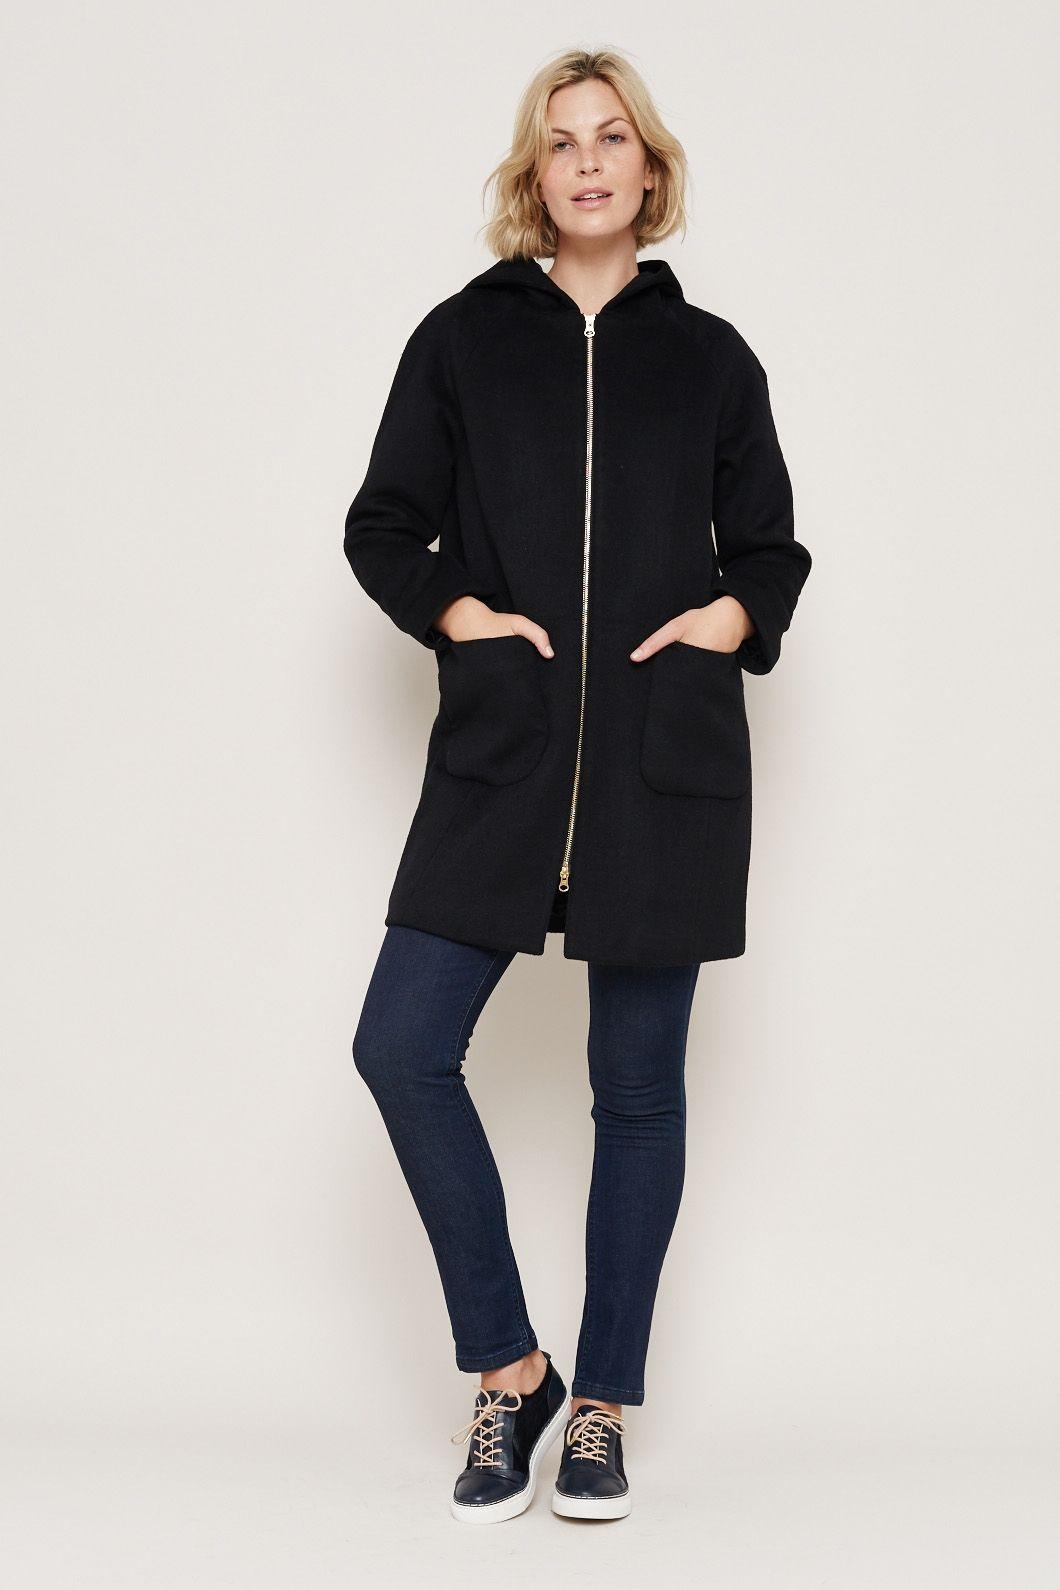 Gorman: Grass is greener coat | Things I like | Pinterest | Fashion